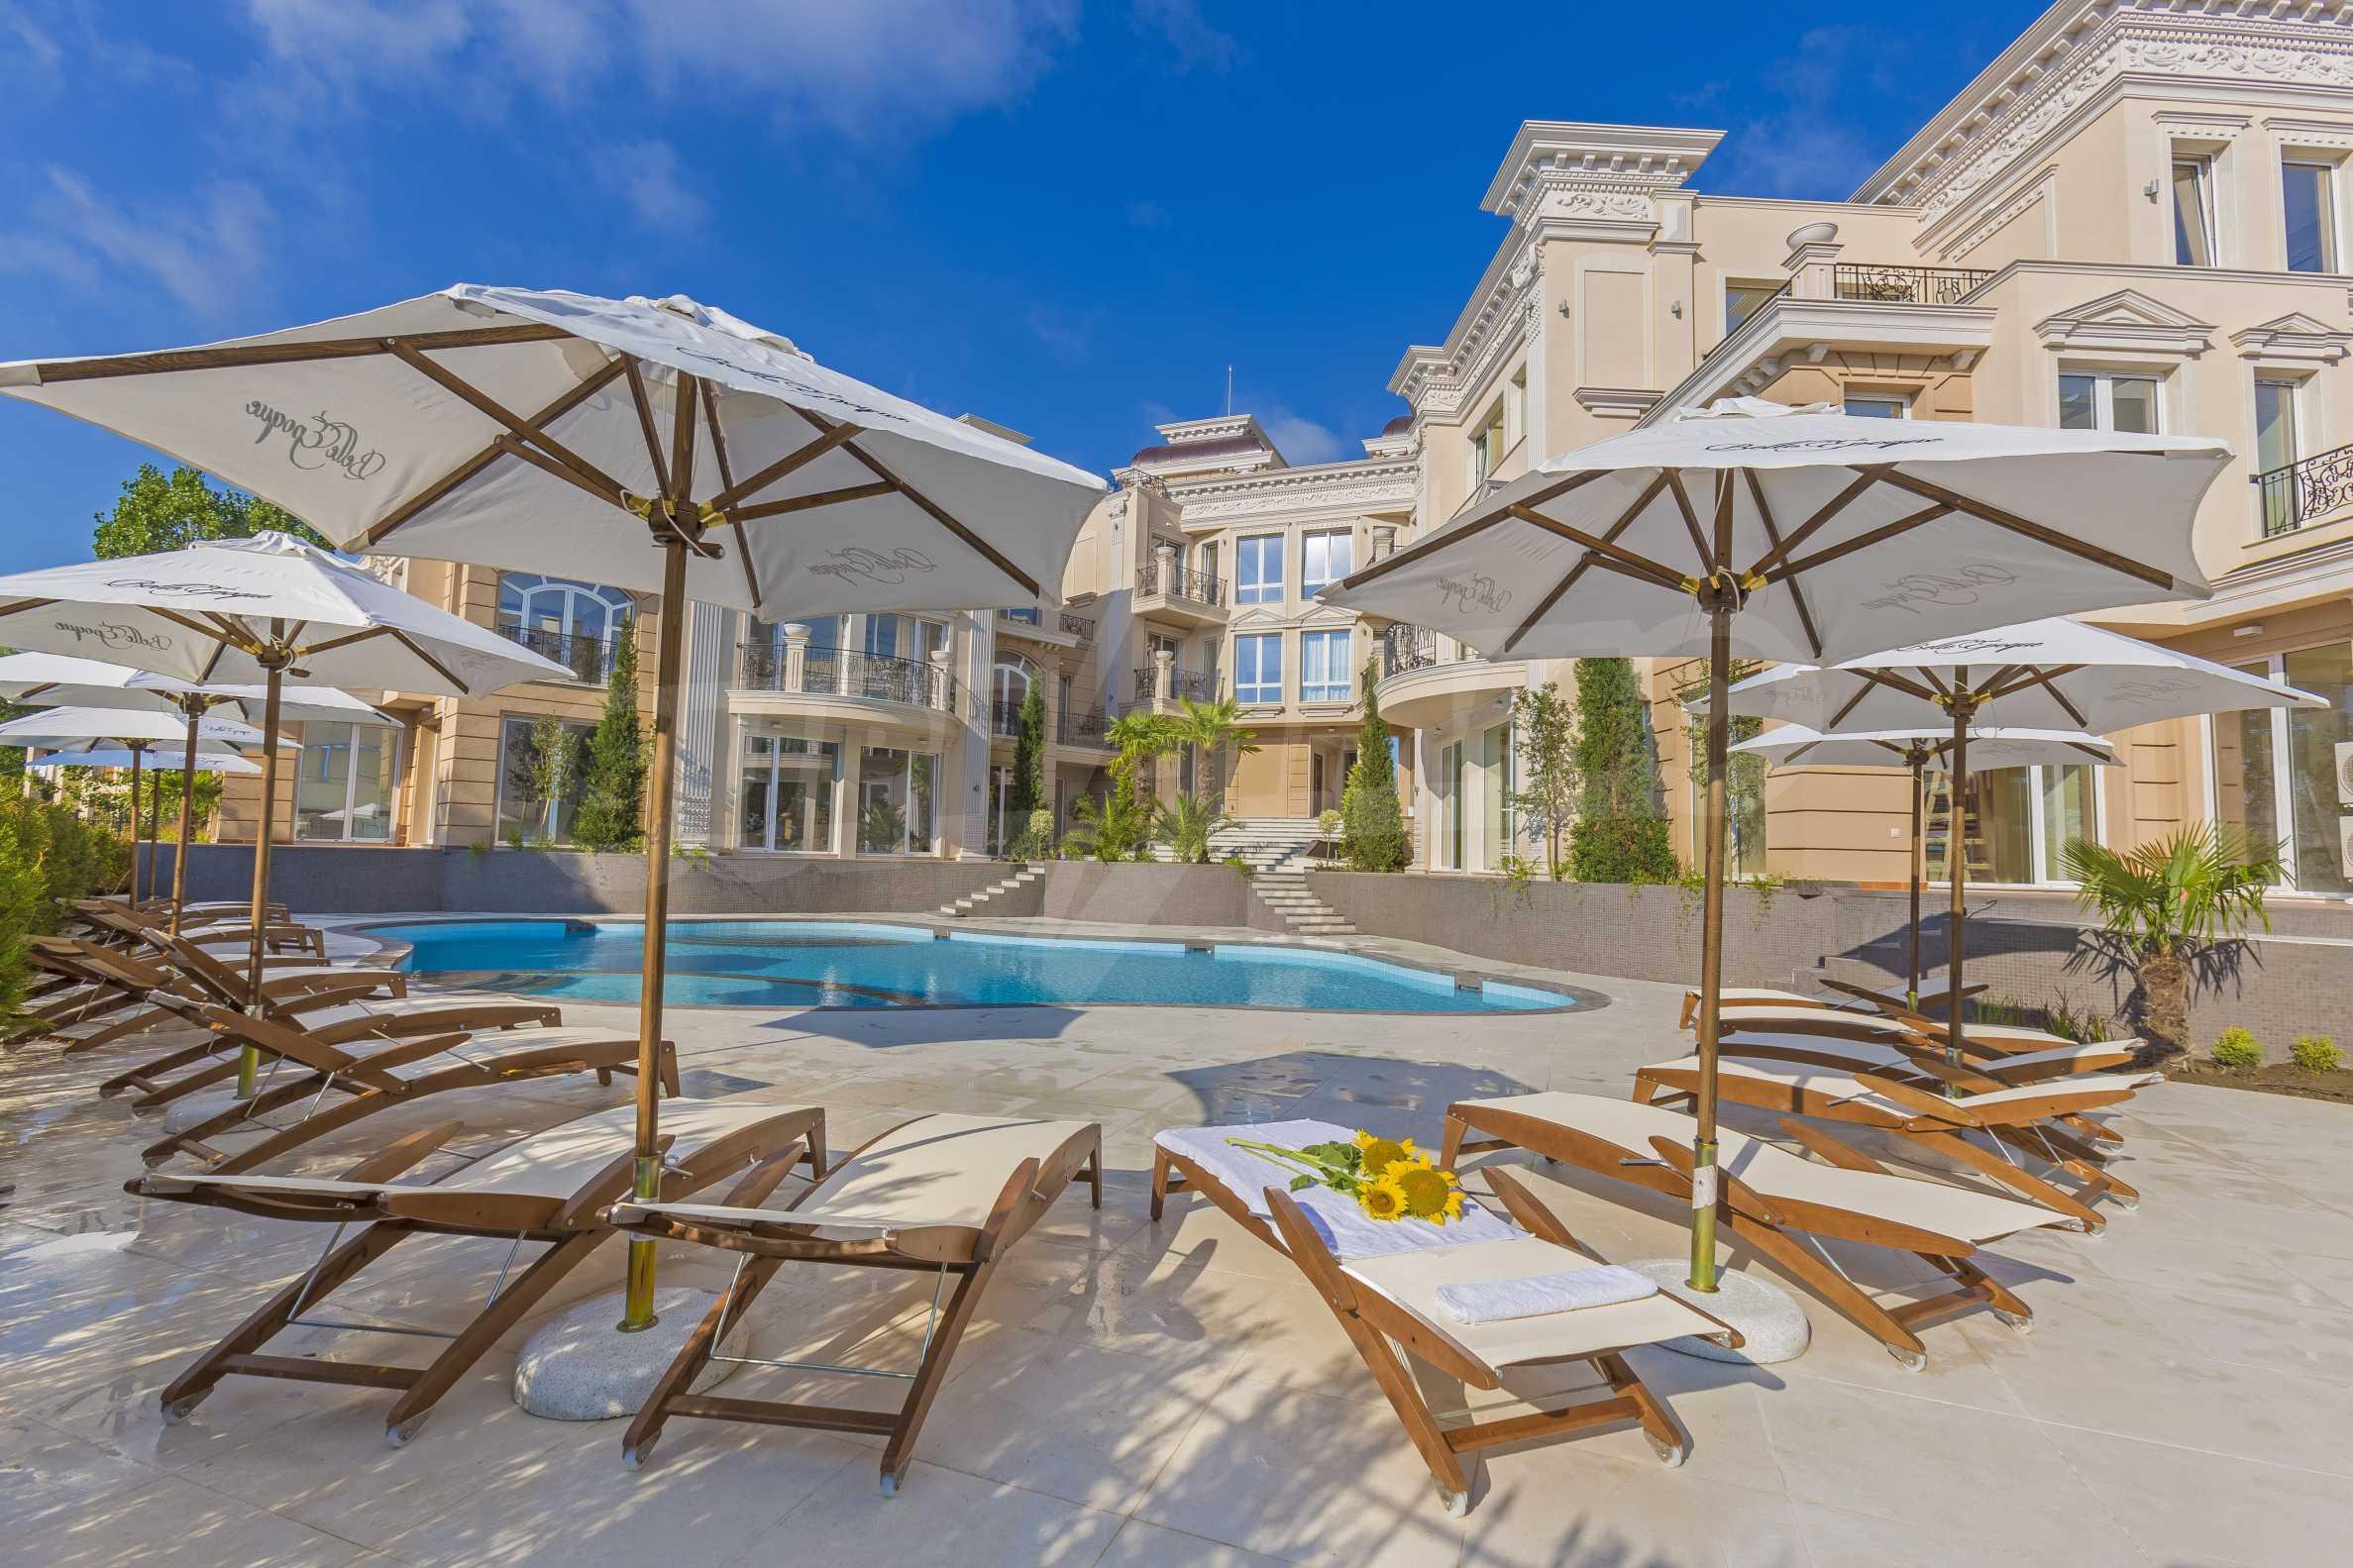 Комфортен двустаен апартамент под наем в Belle Époque Beach Residence, курорт Лозенец 31